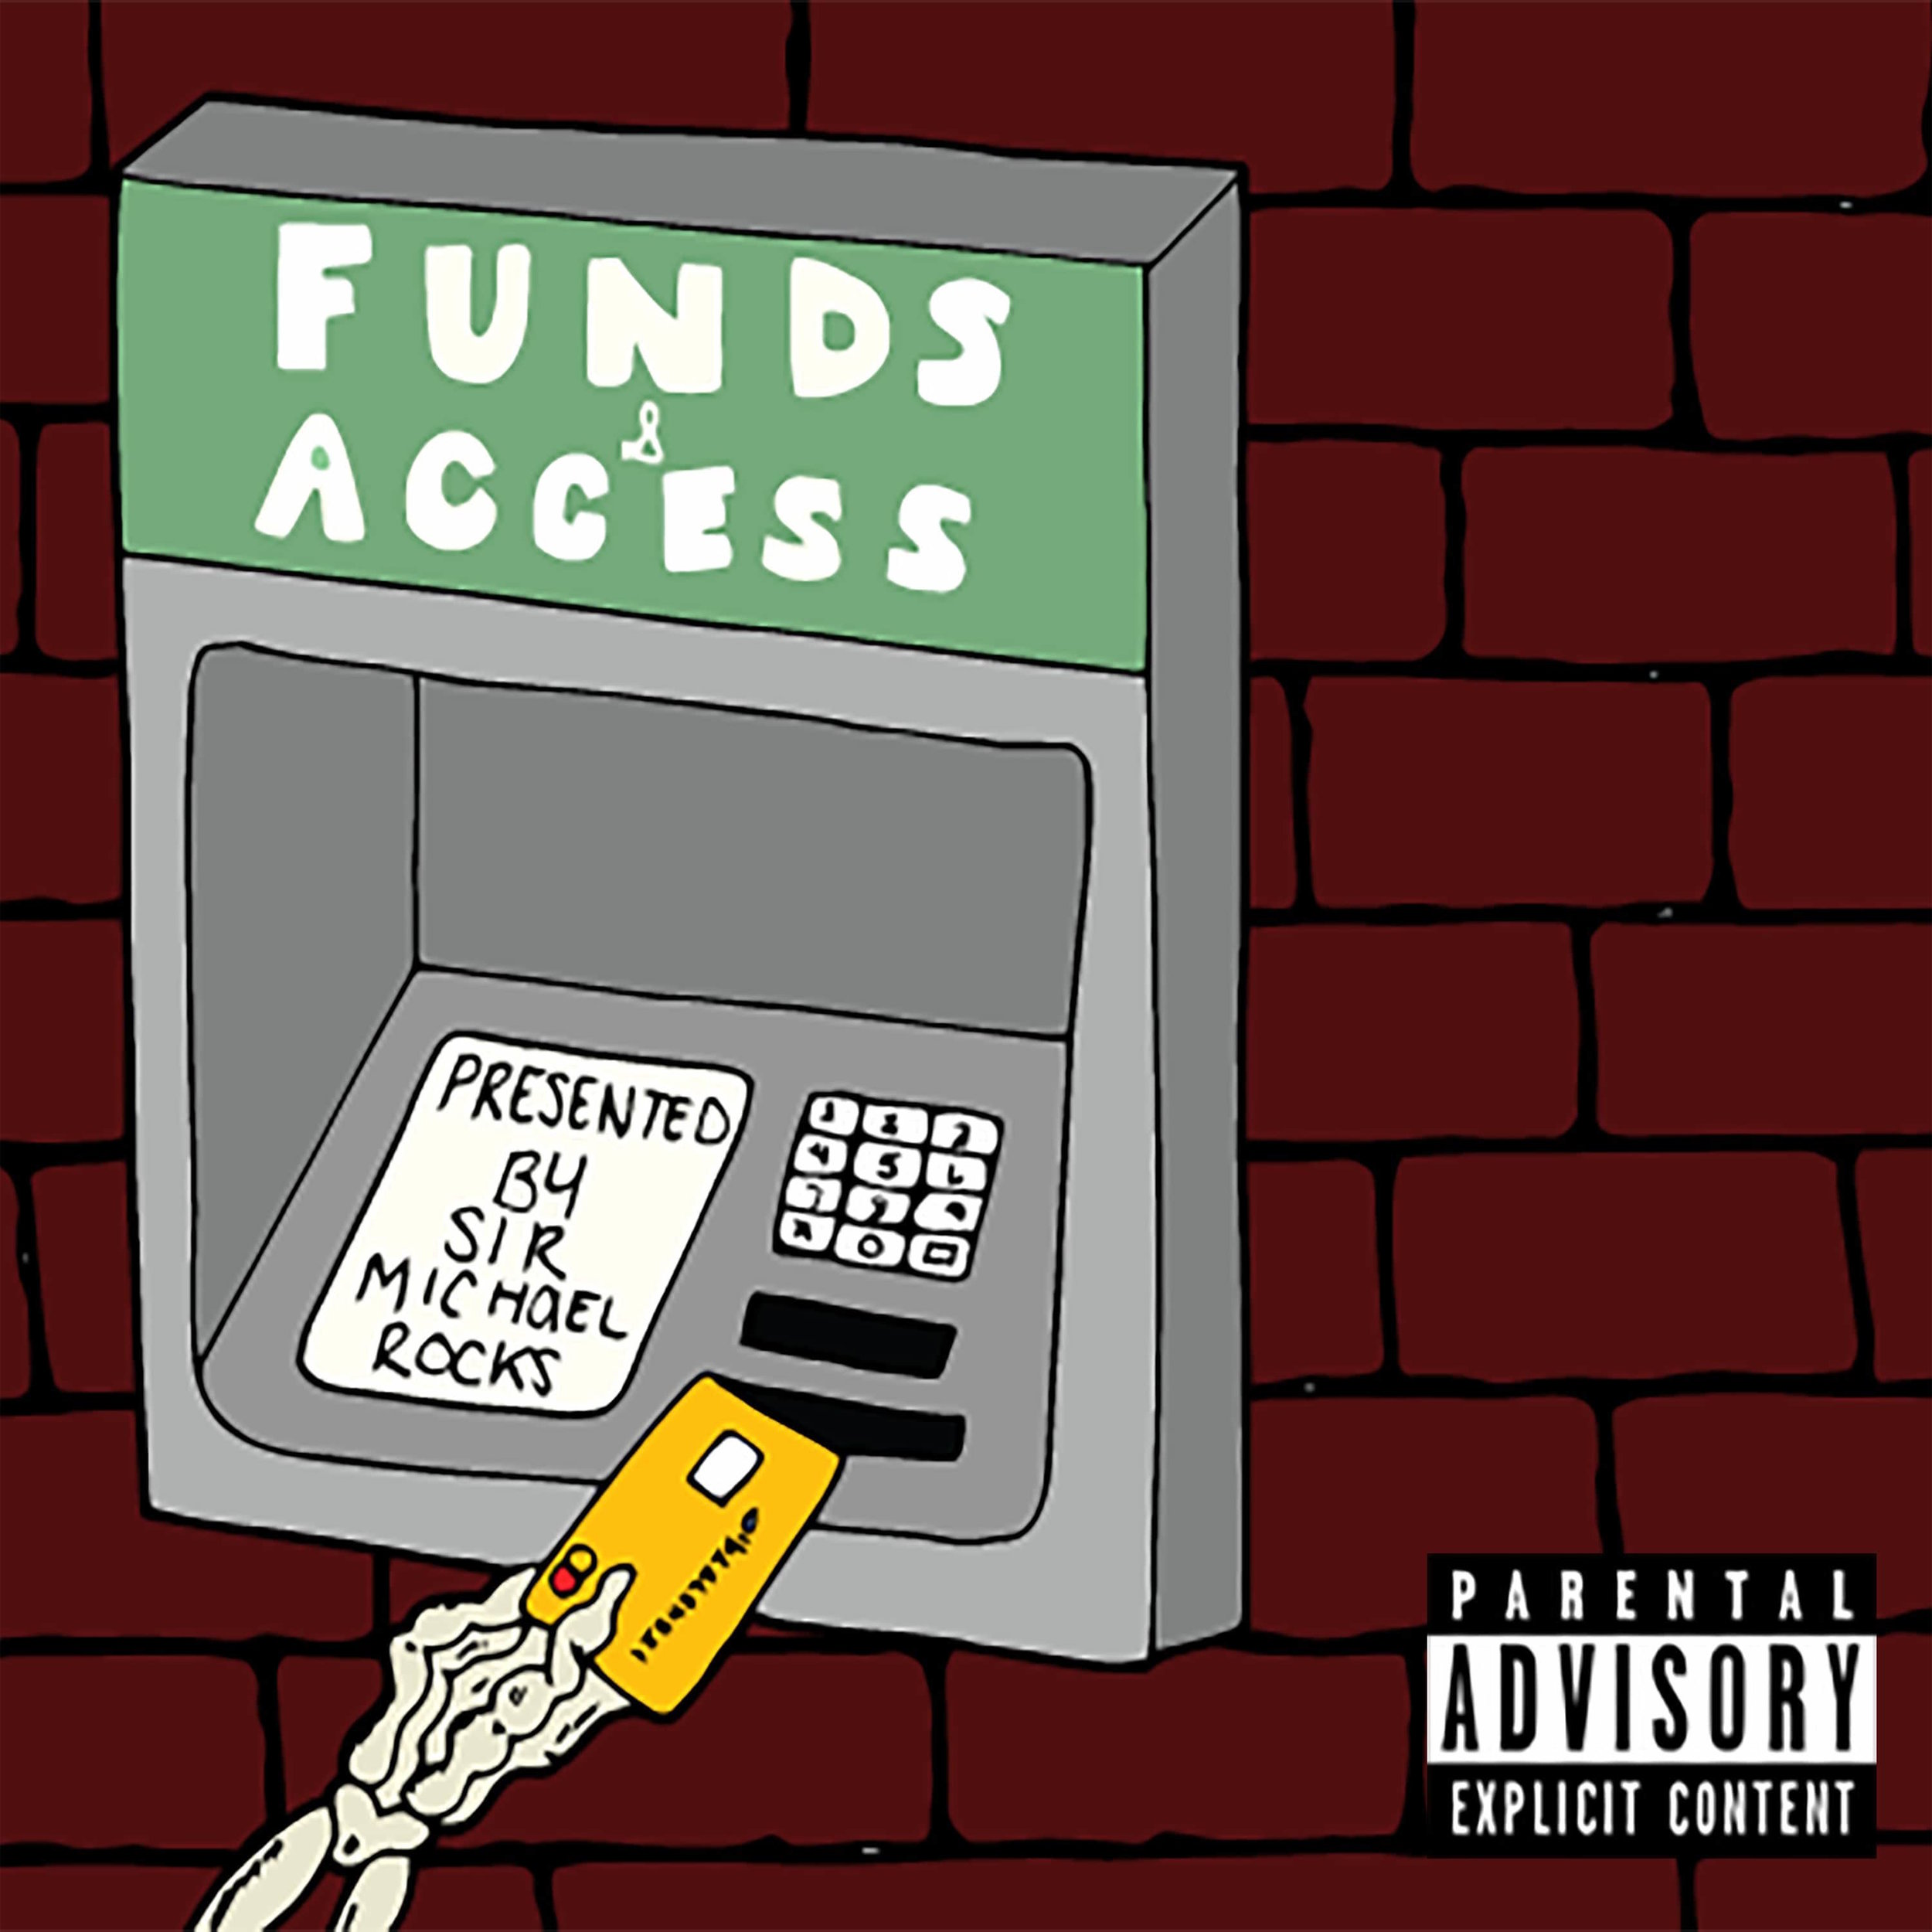 Funds & Access   Sir Michael Rocck